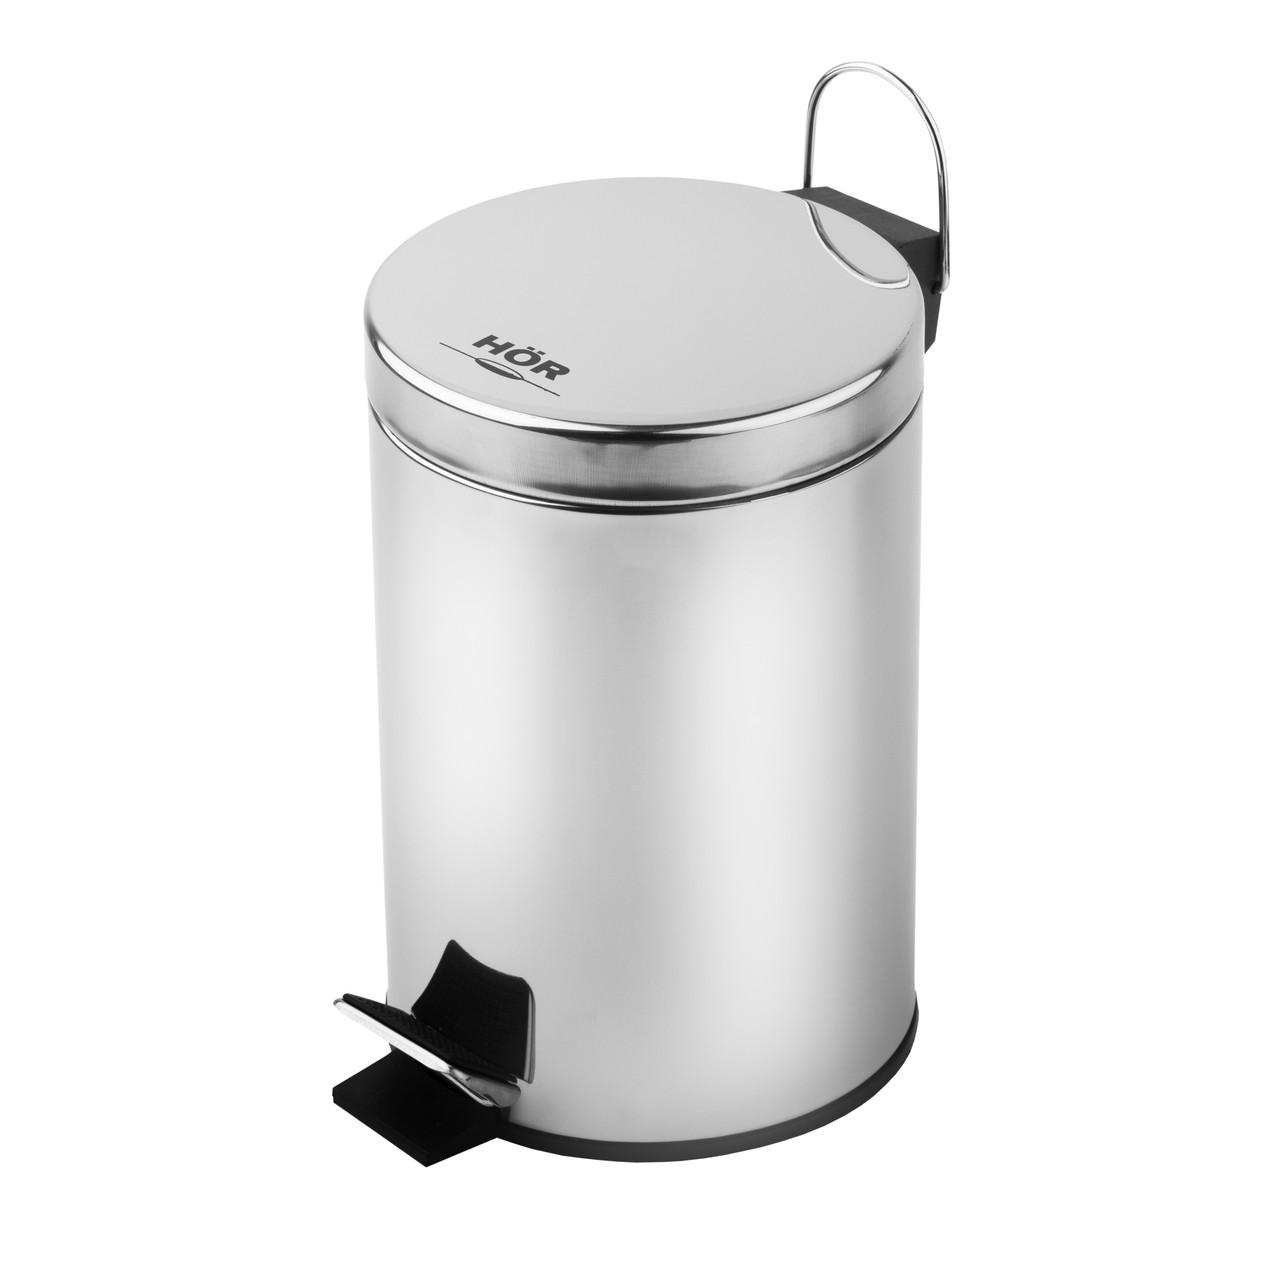 Контейнер для мусора HÖR-10018 MM 5 L